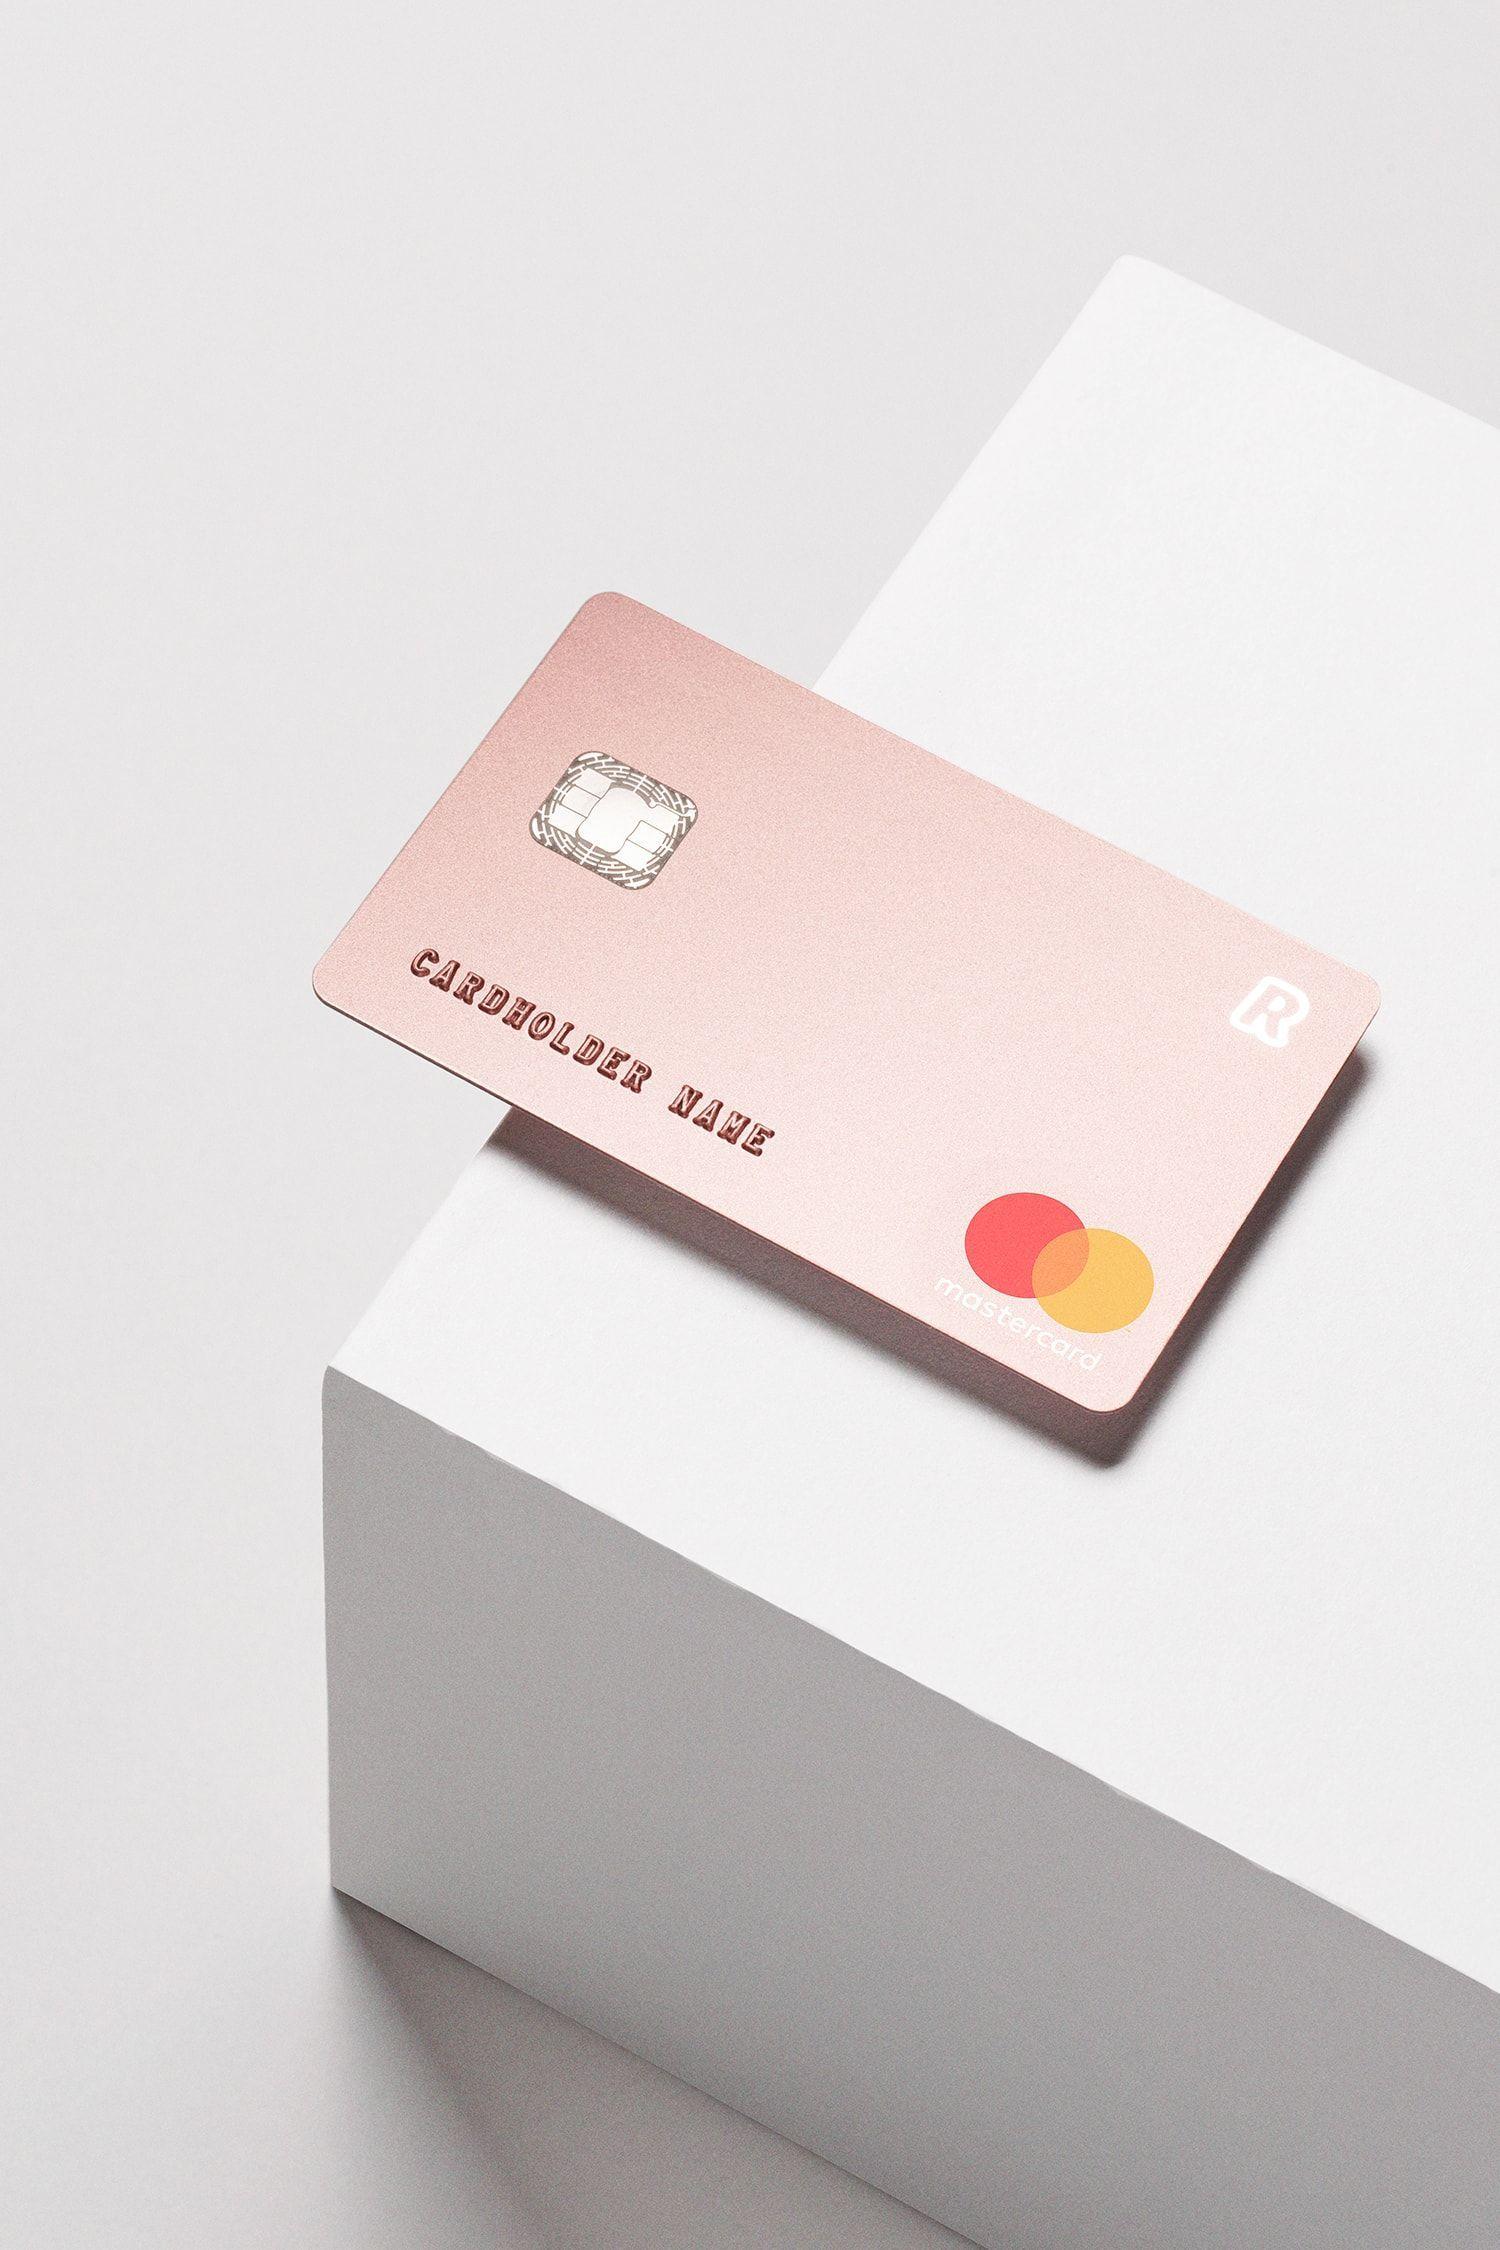 Credit Card Design Creditcard Blond Credit Card Design Debit